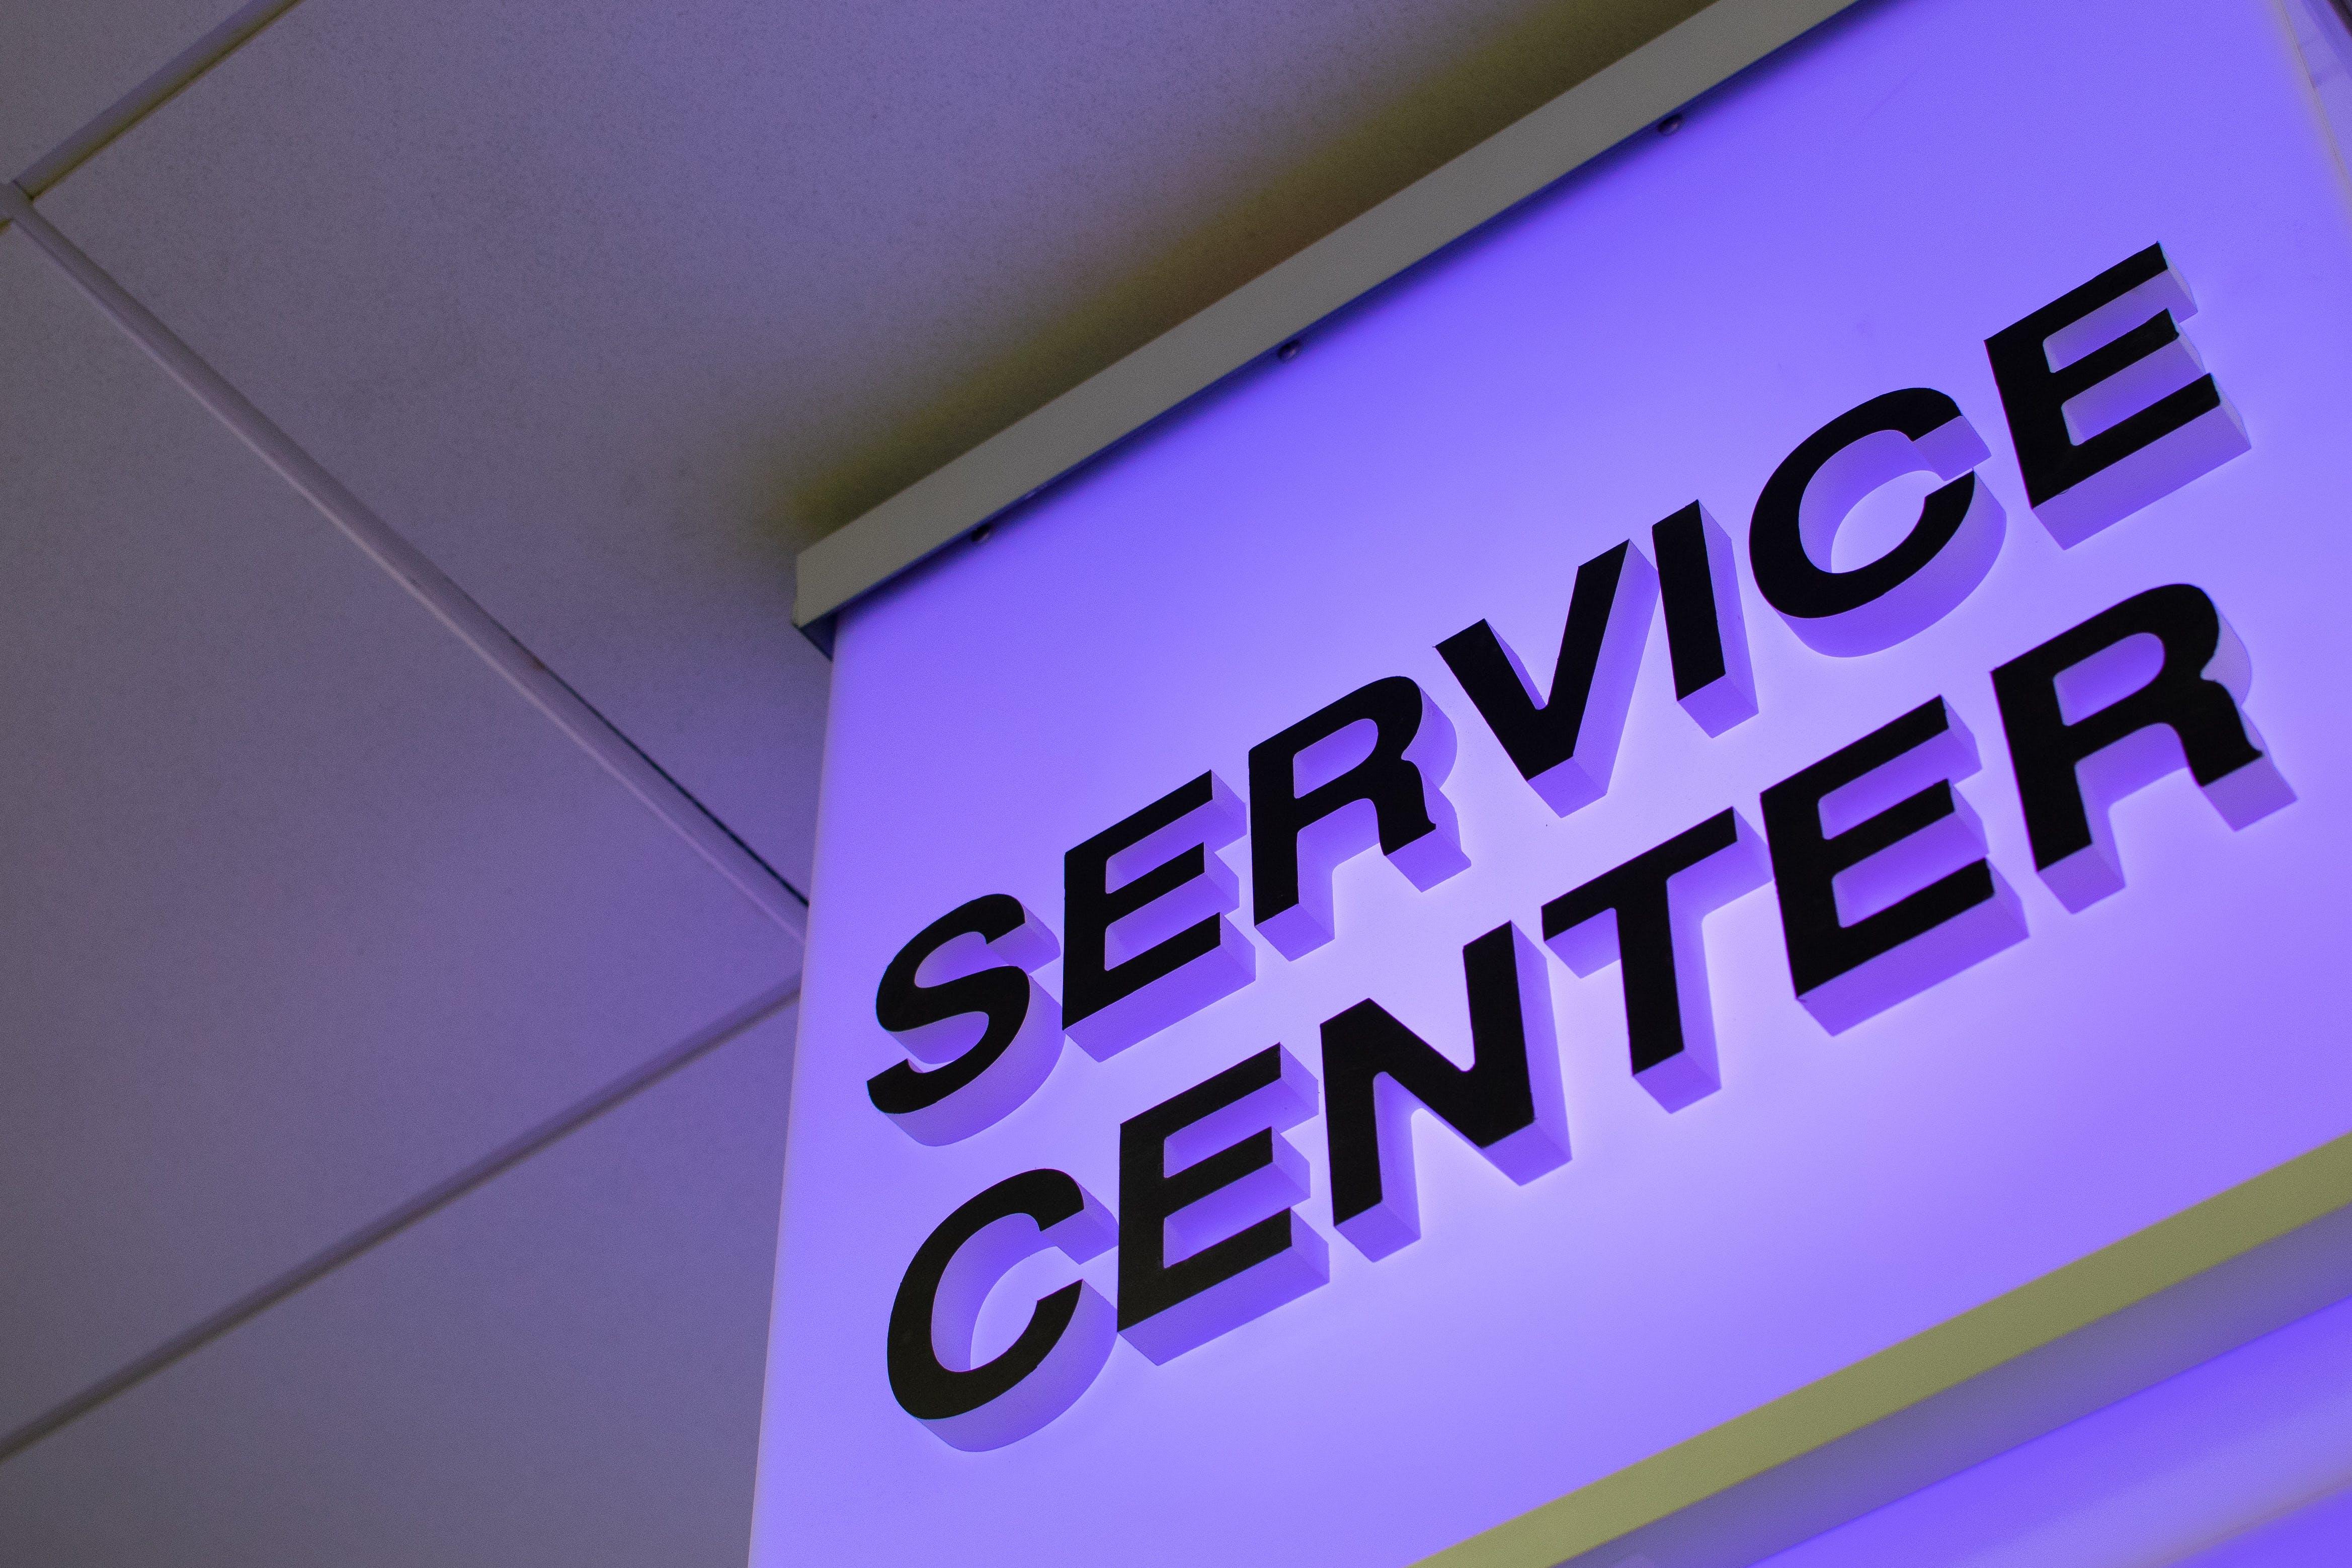 Service Center Signage